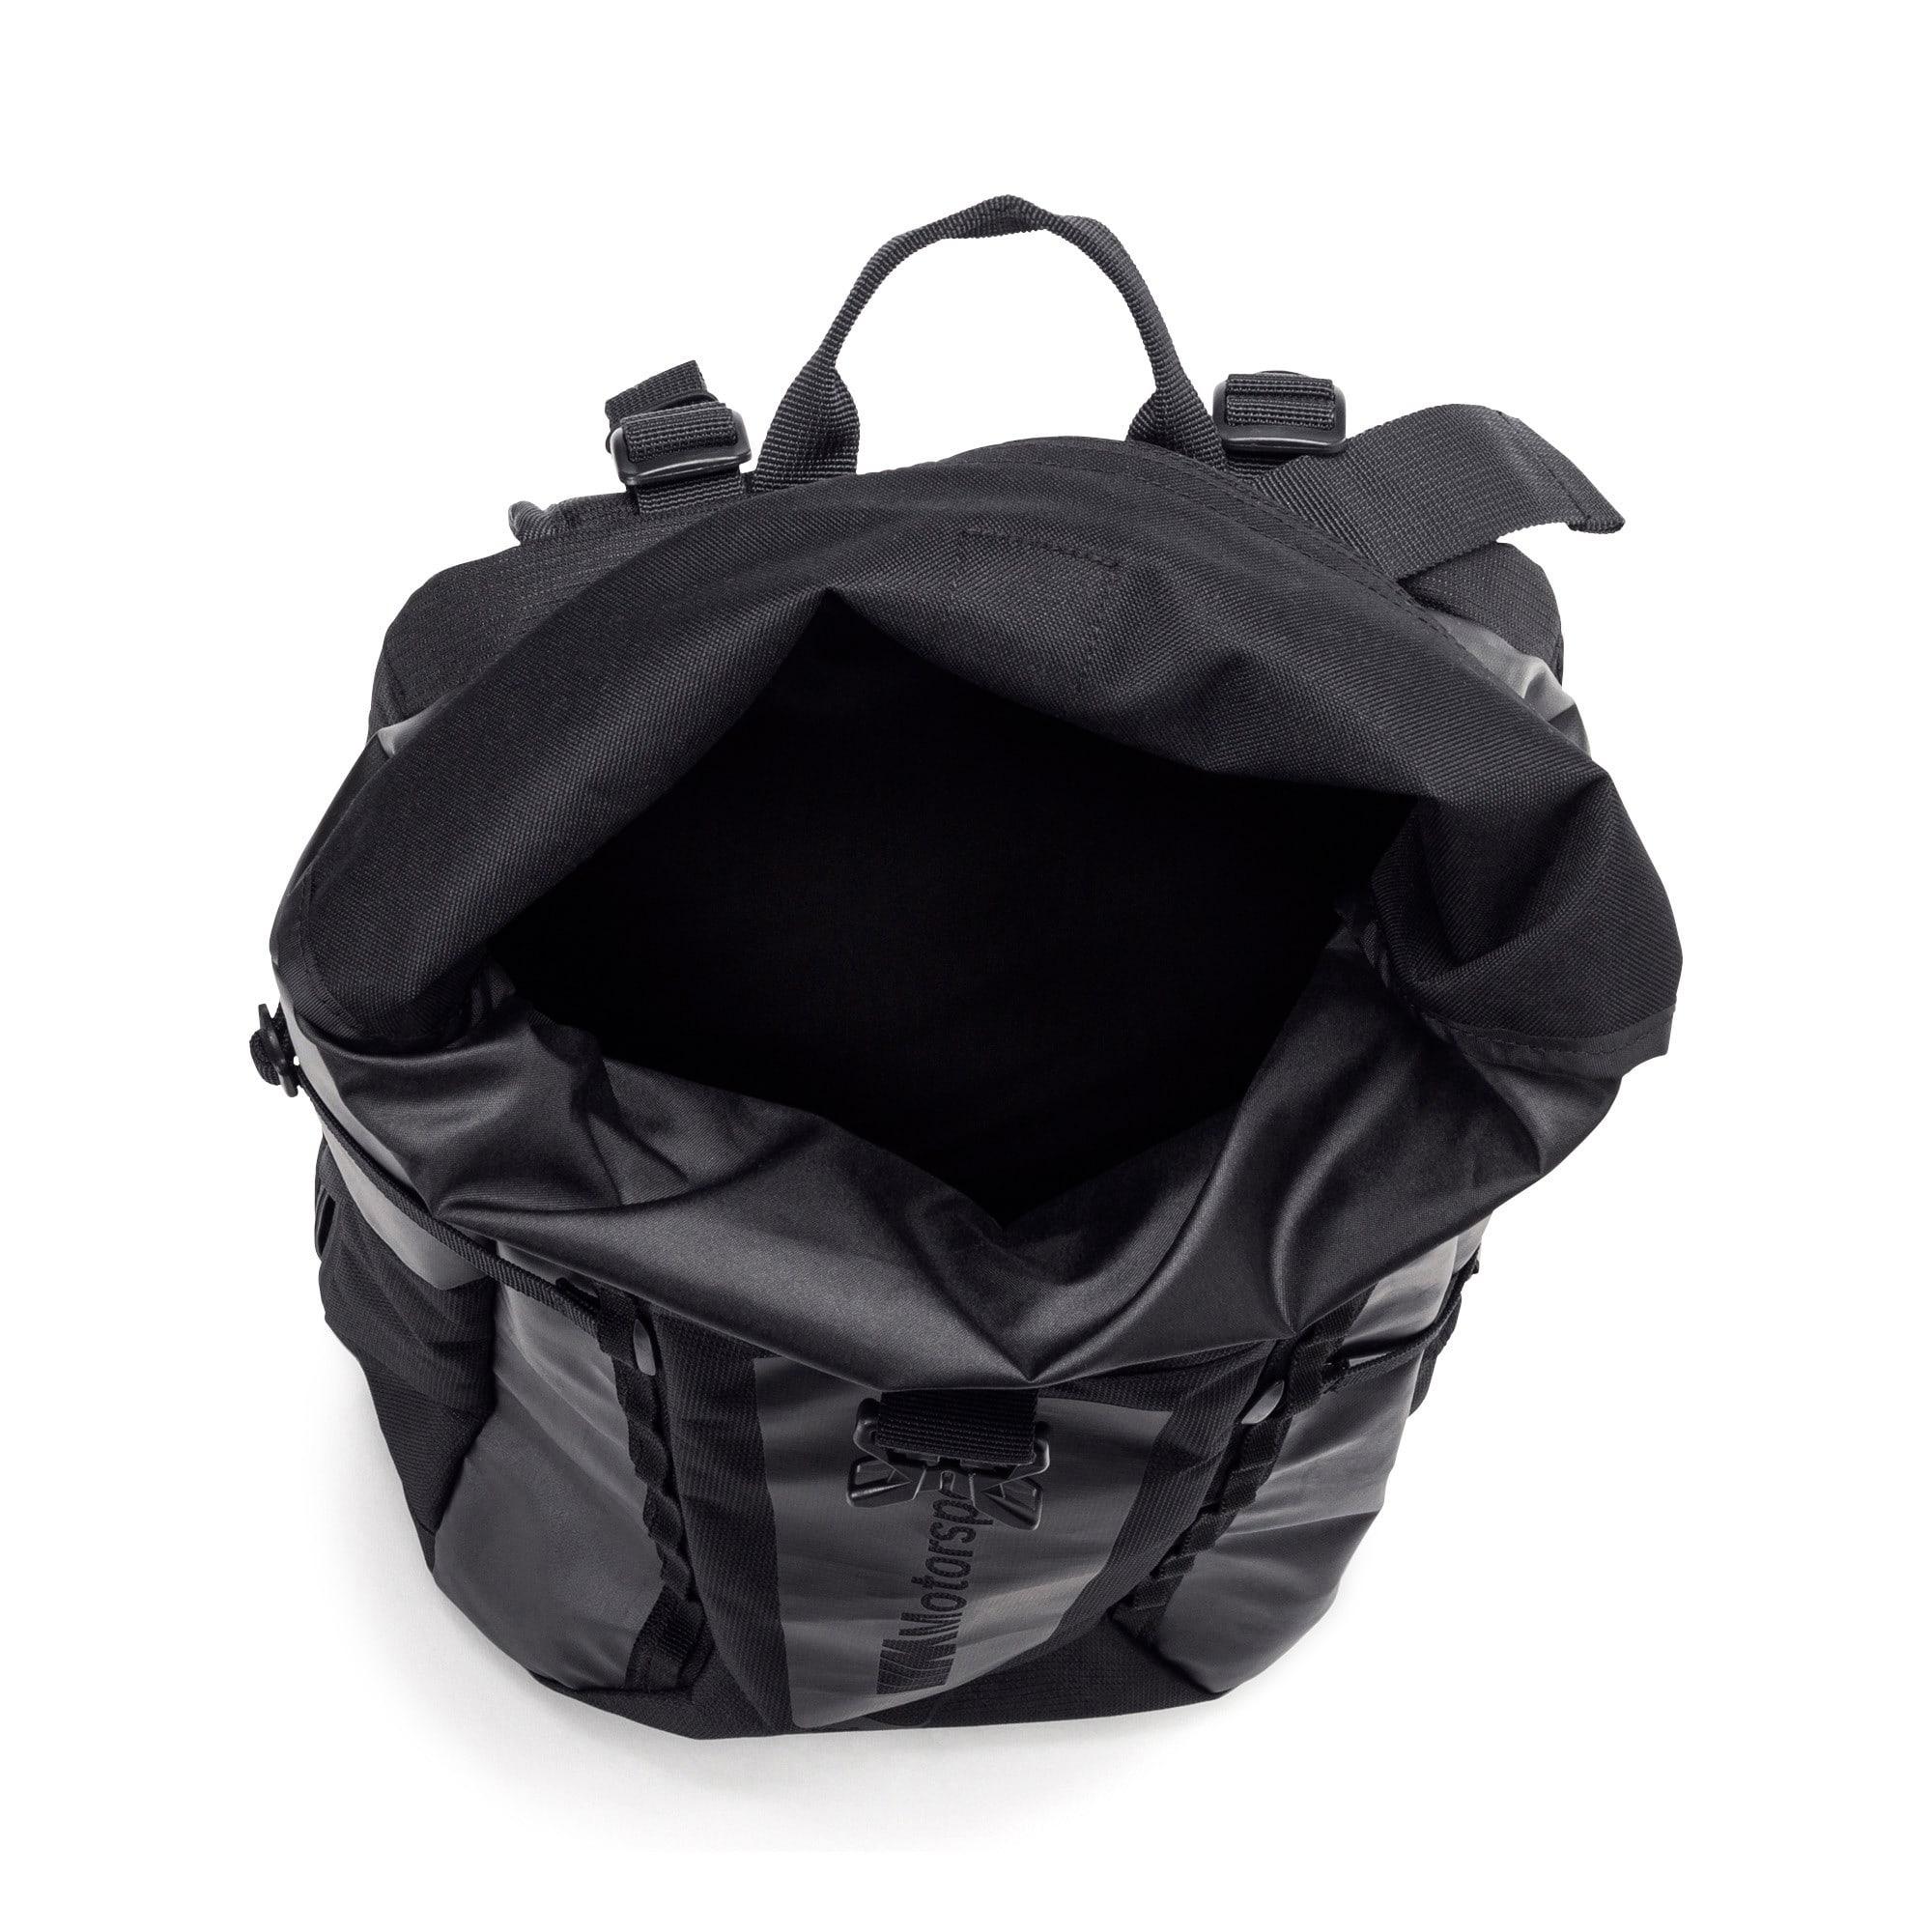 Thumbnail 4 of BMW M Motorsport Capsule Backpack, Anthracite, medium